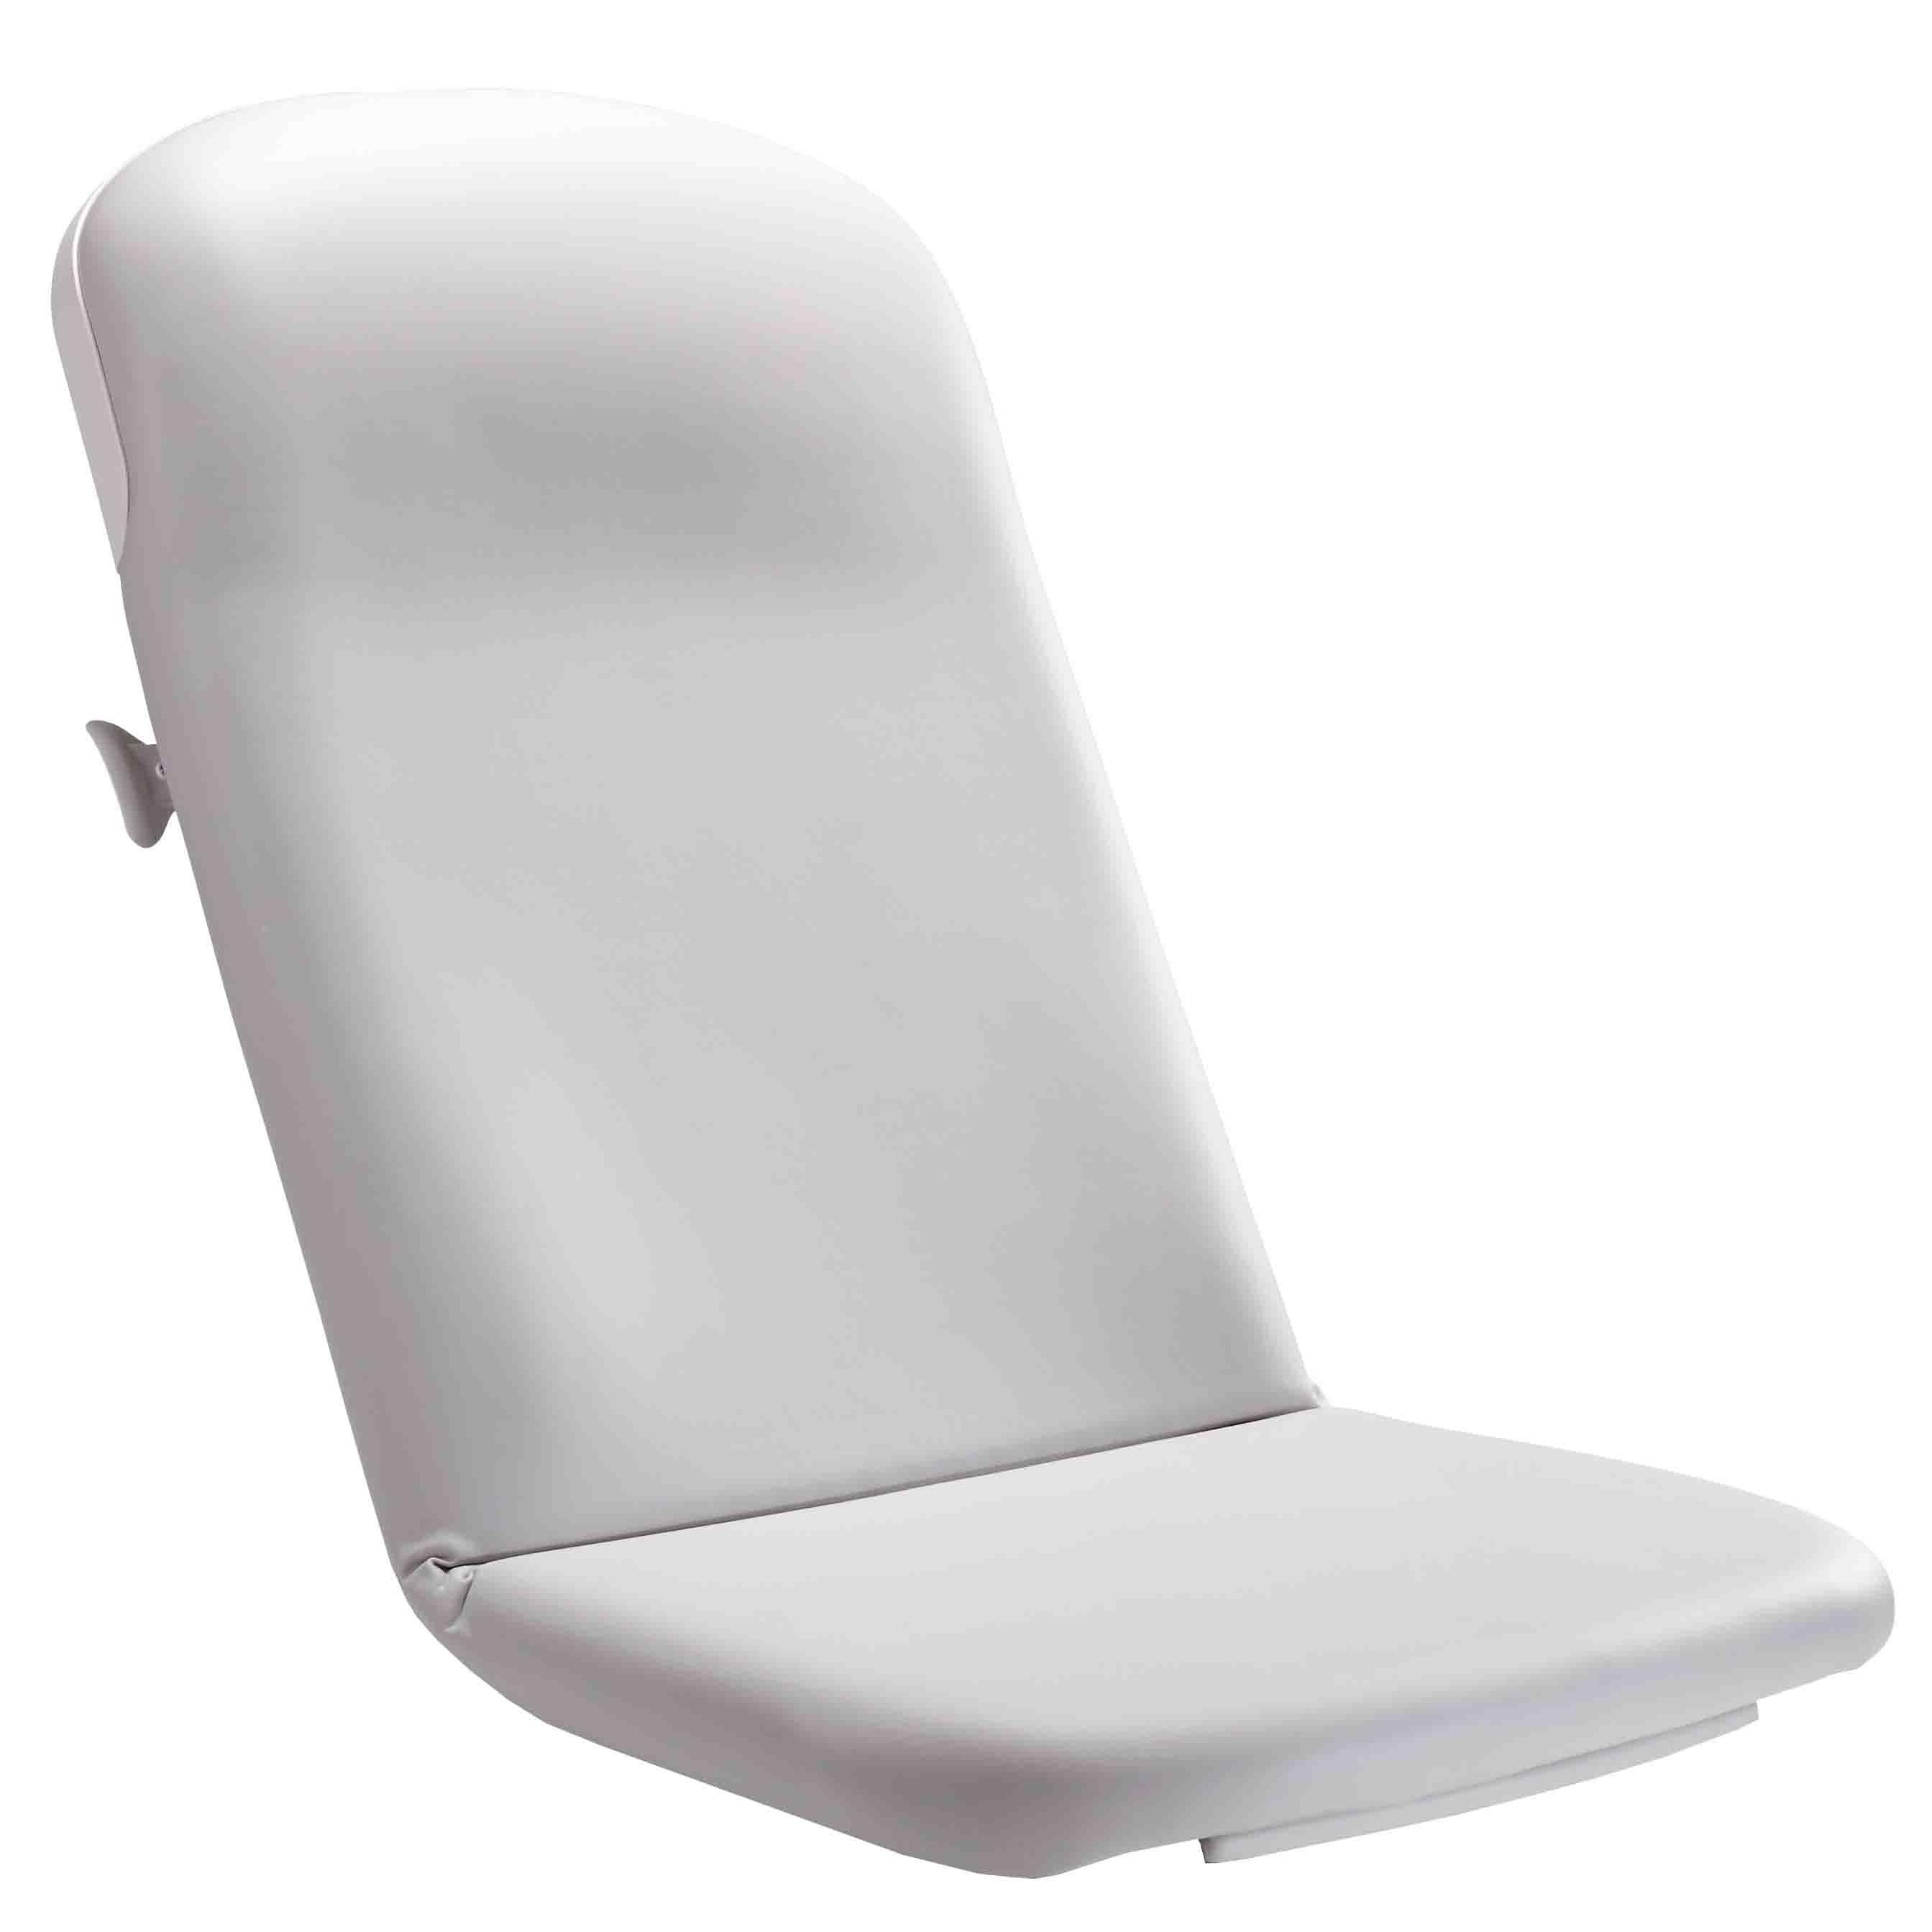 Ritter 224/225 Seamless Upholstery Top